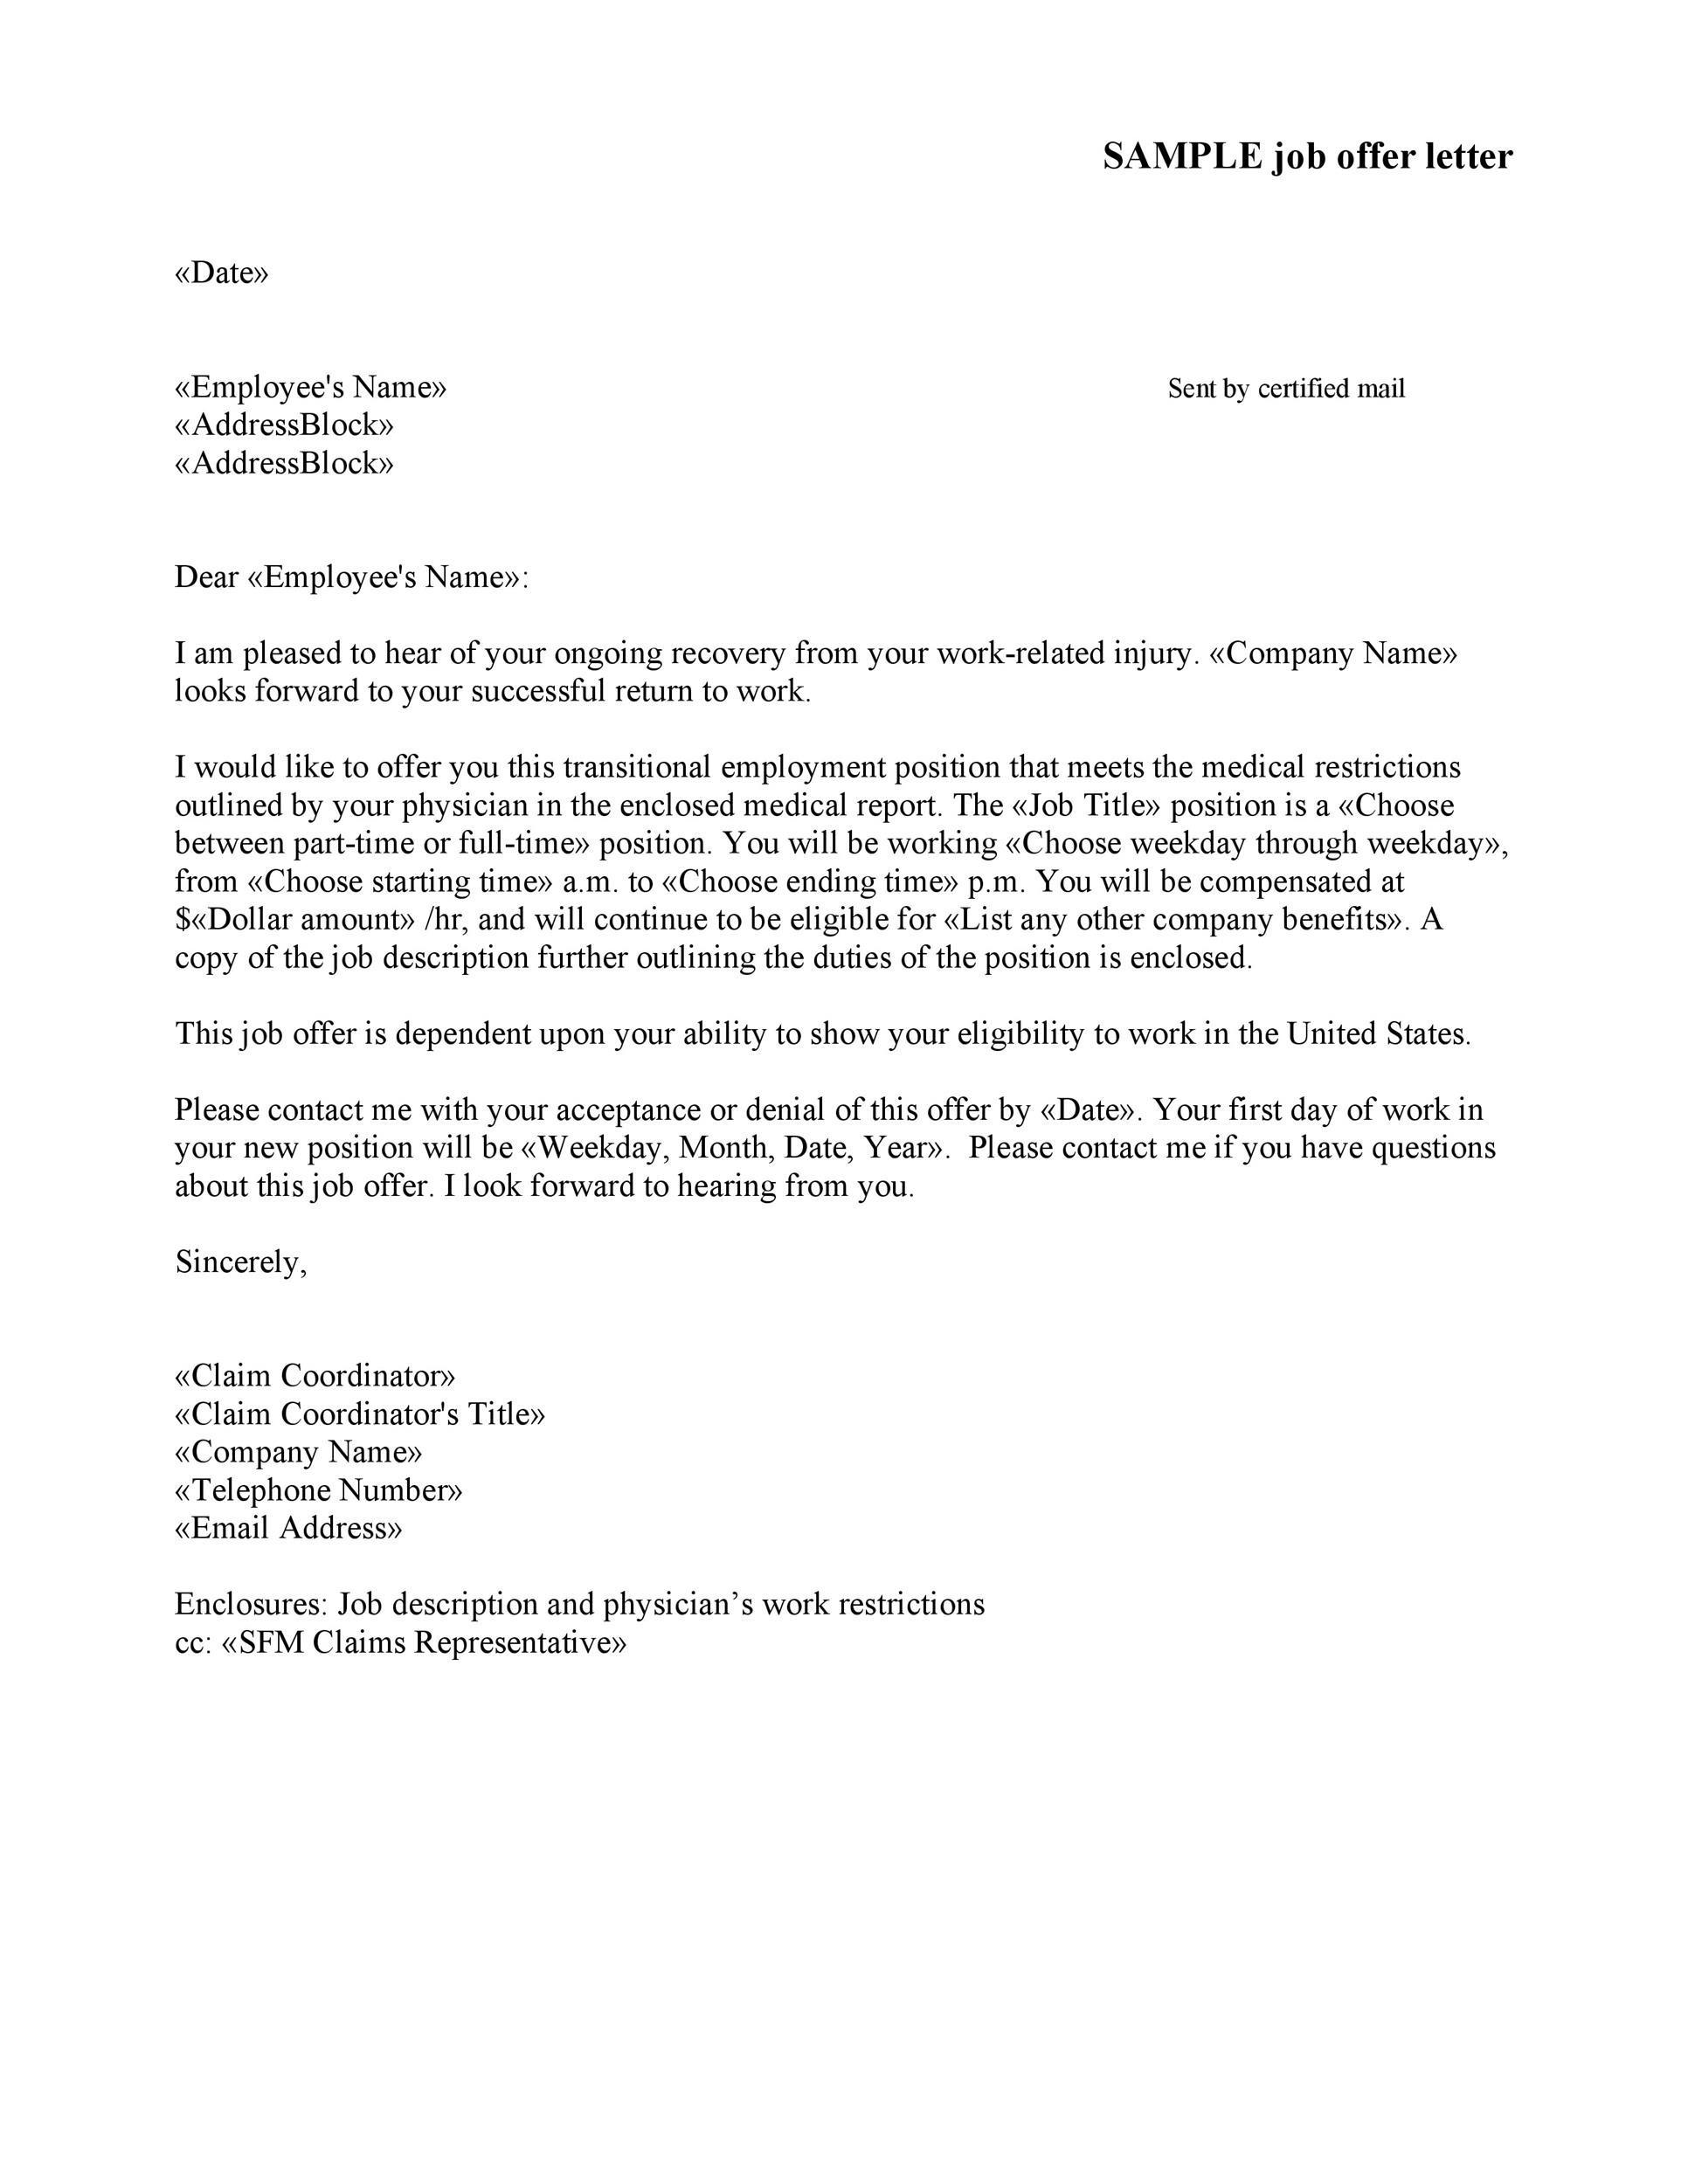 Free Offer letter 19